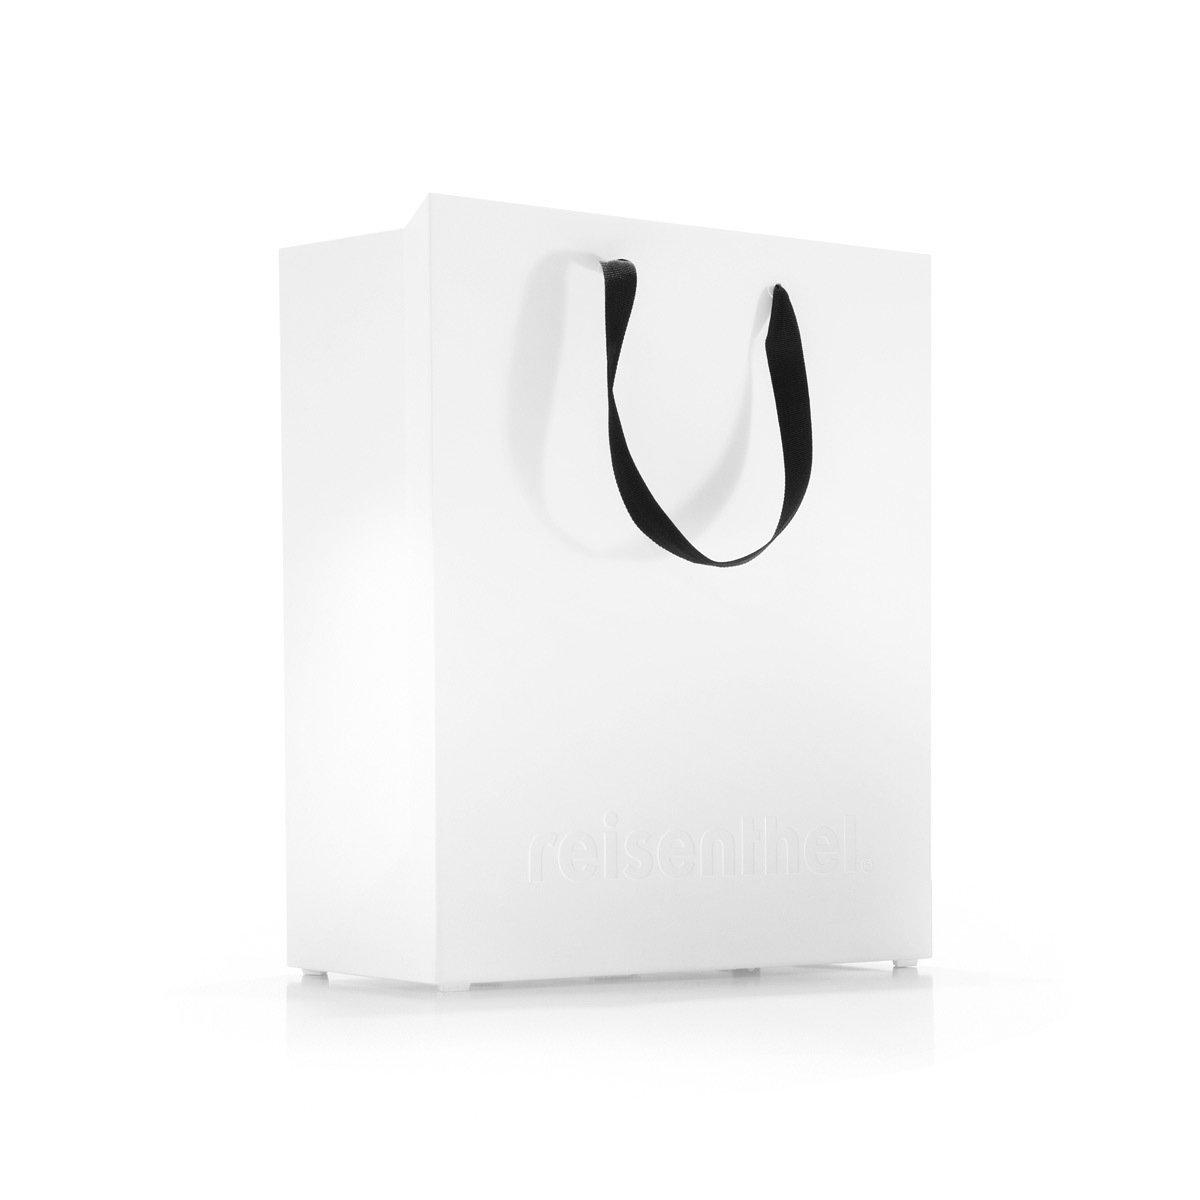 Reisenthel Binbox white XD1001 reisenthel Accessoires